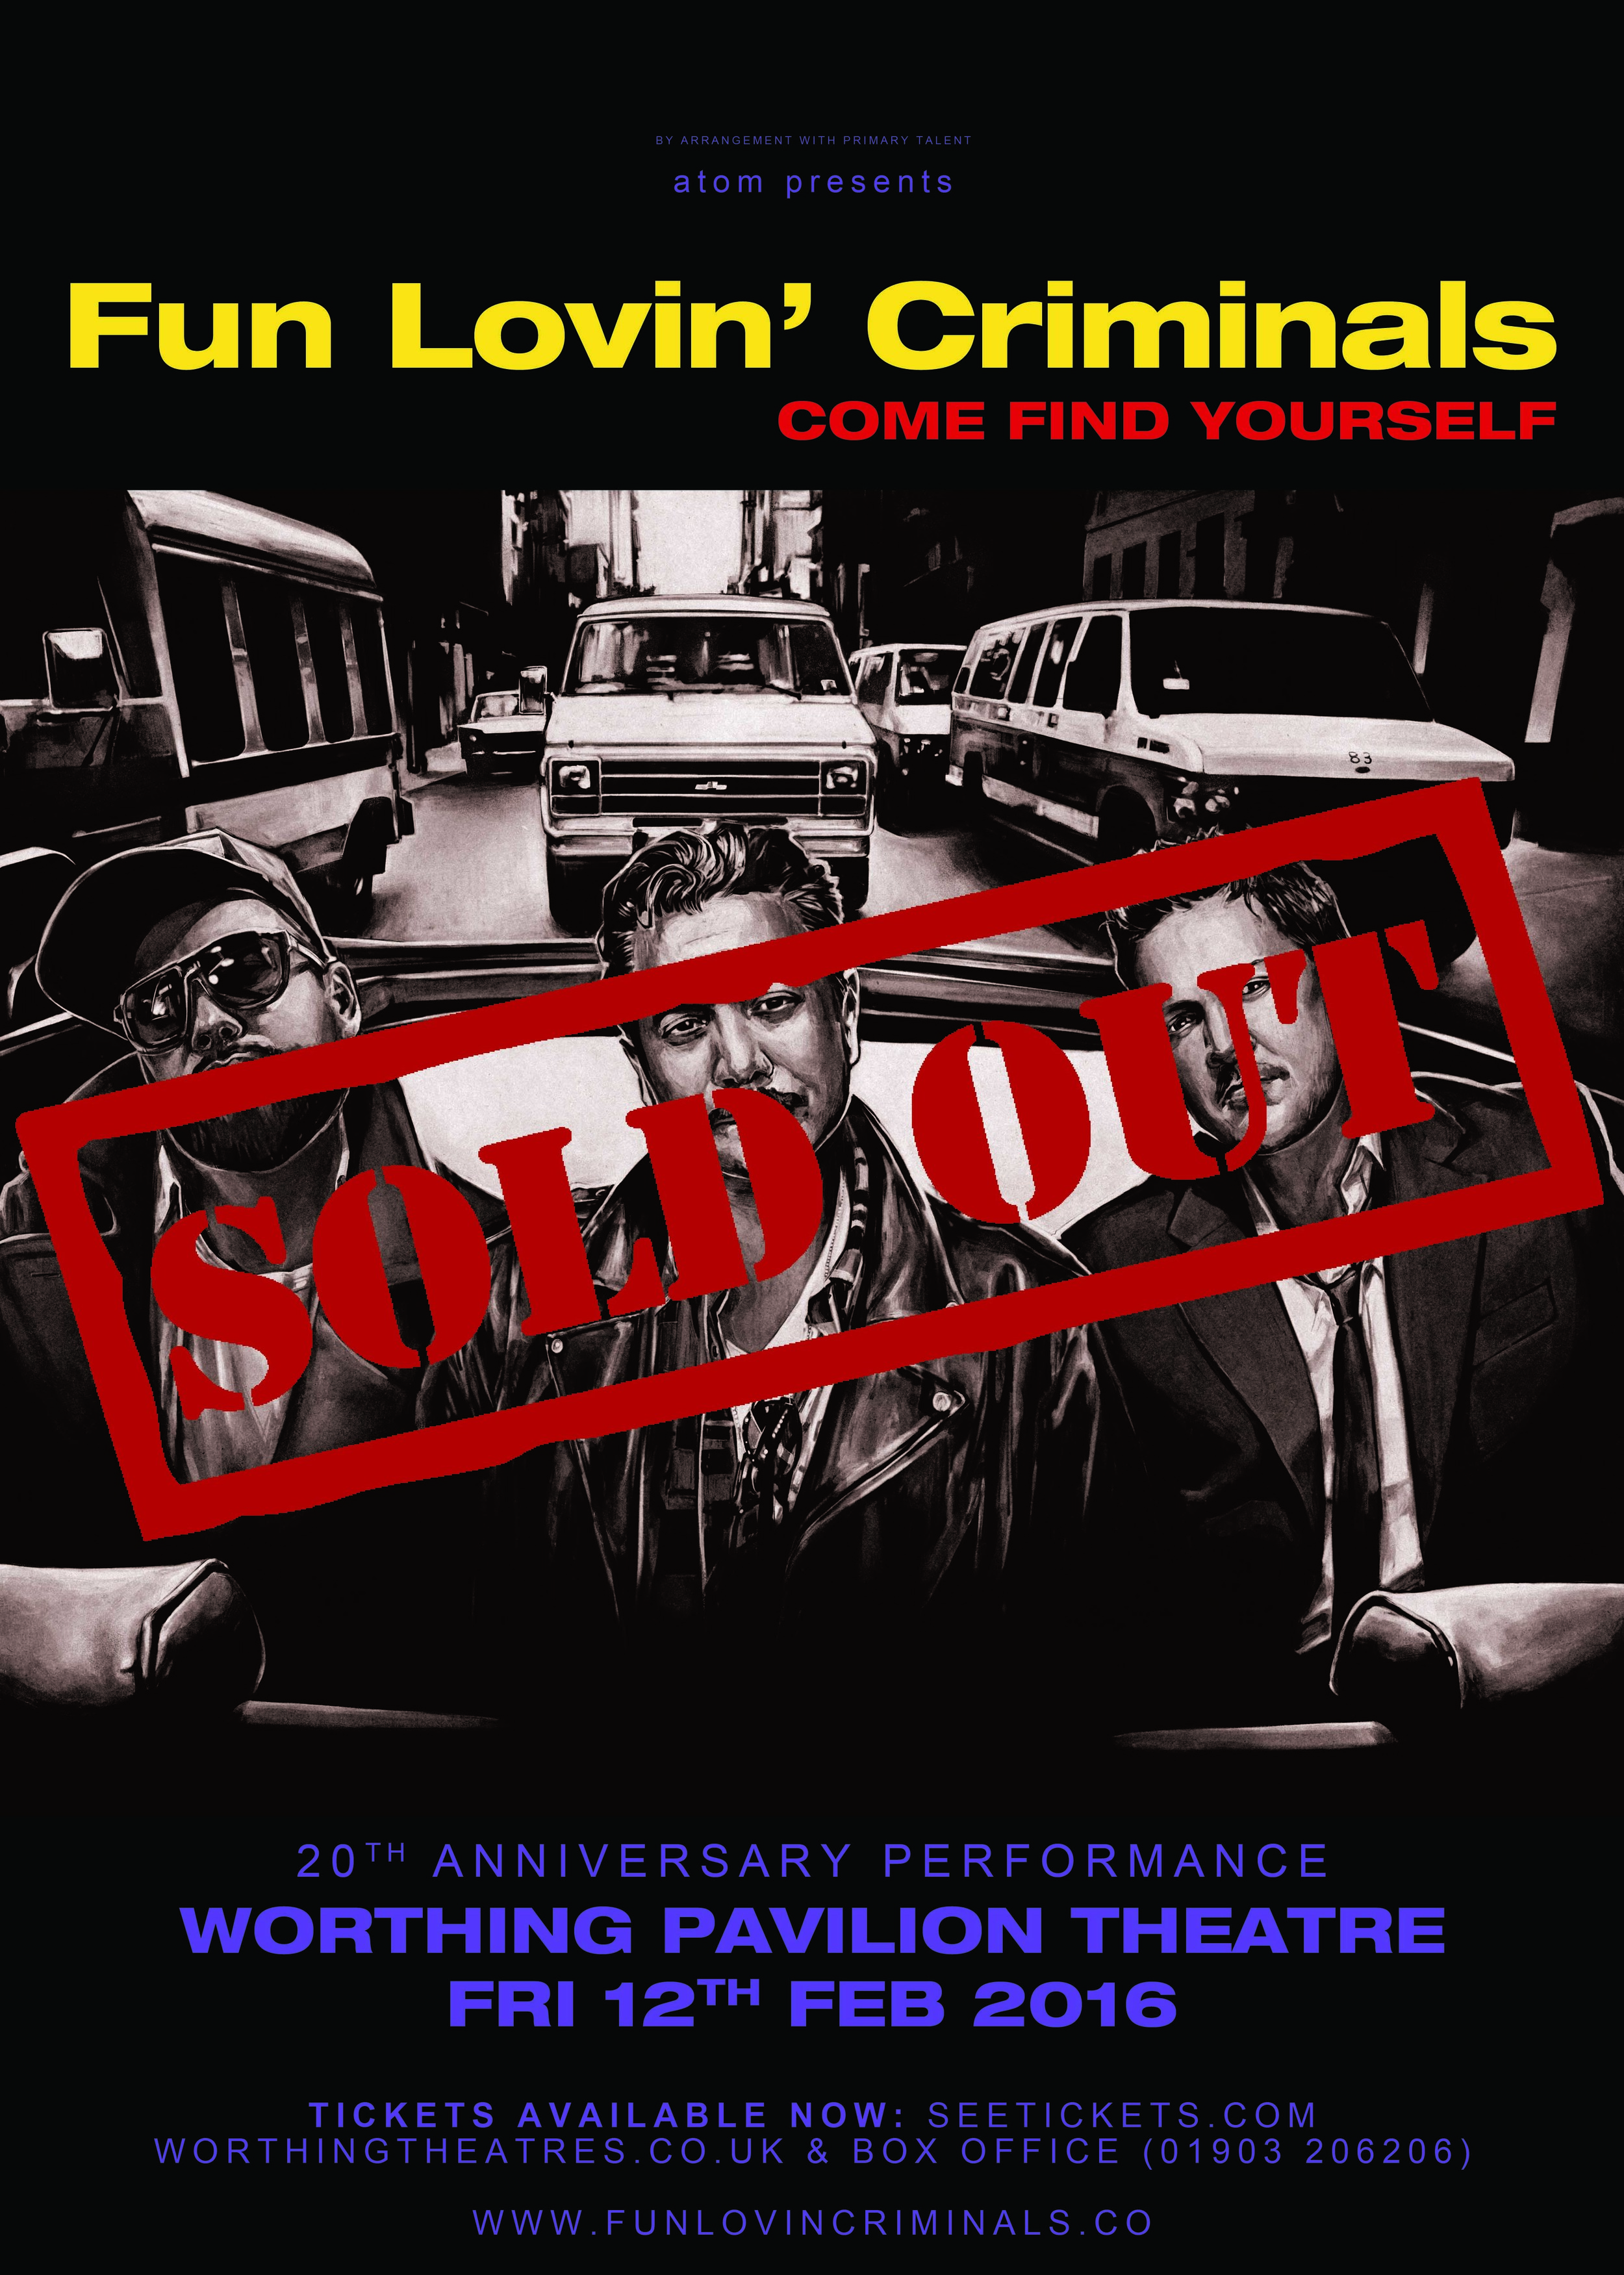 Fun Lovin' Criminals